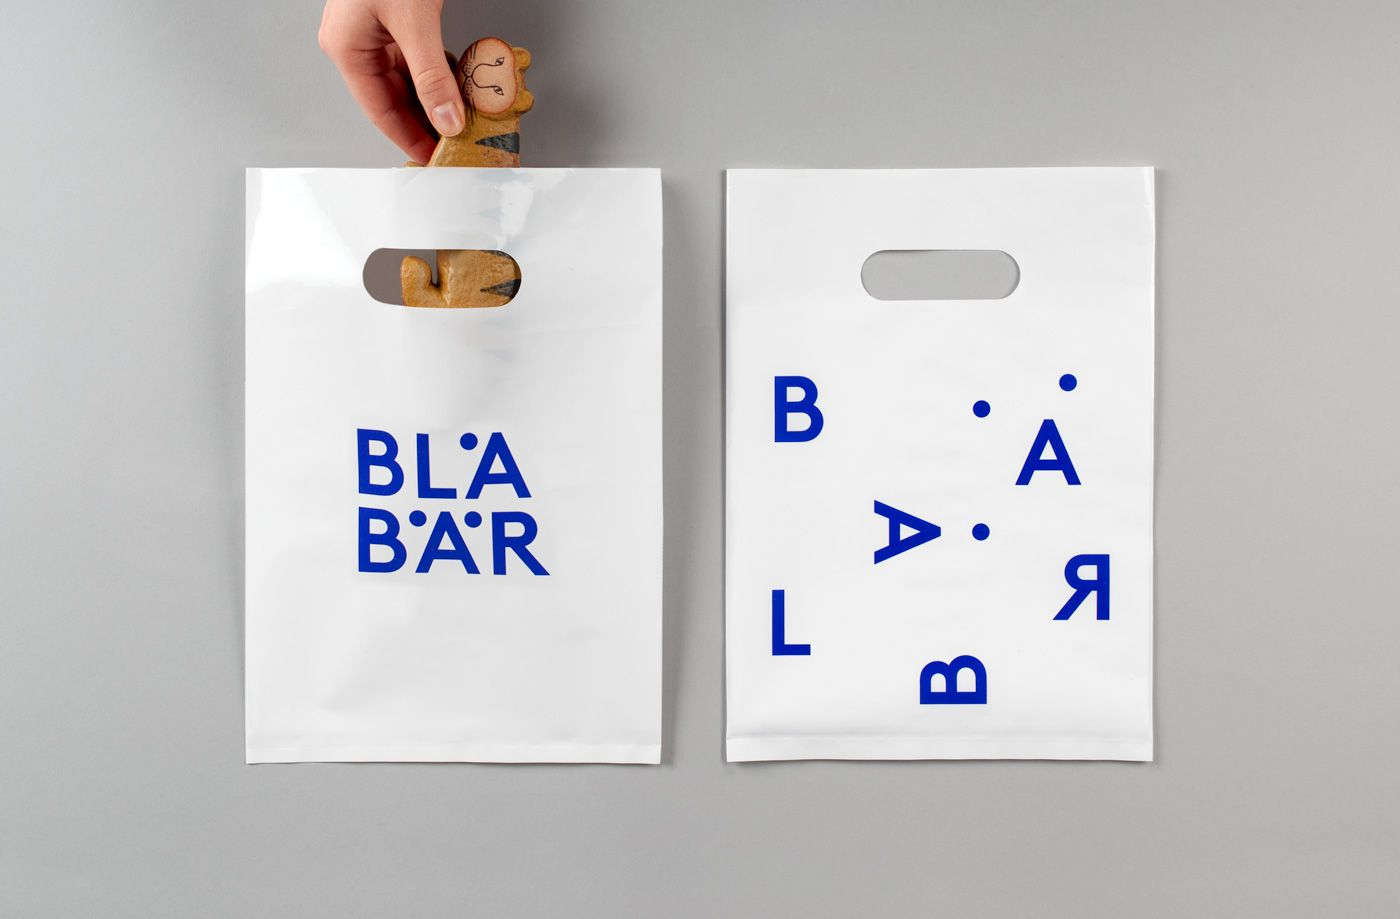 BVD – Dynamic identity for Blå Bär, a concept store in Osaka selling Scandinavian goods